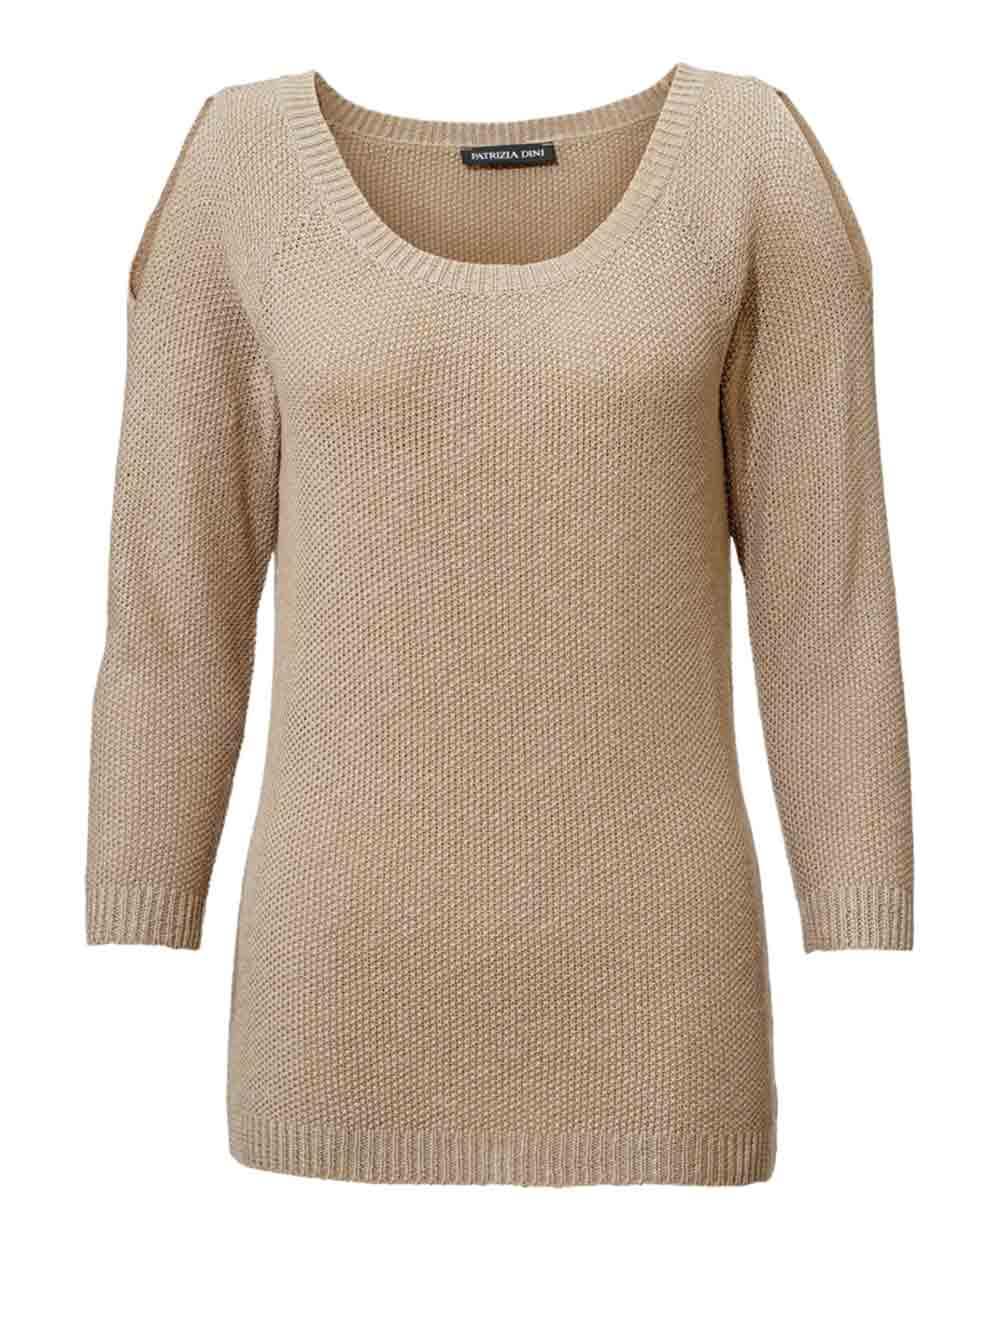 PATRIZIA DINI Strickpullover Damen taupe 004.052 Missforty Online Shop